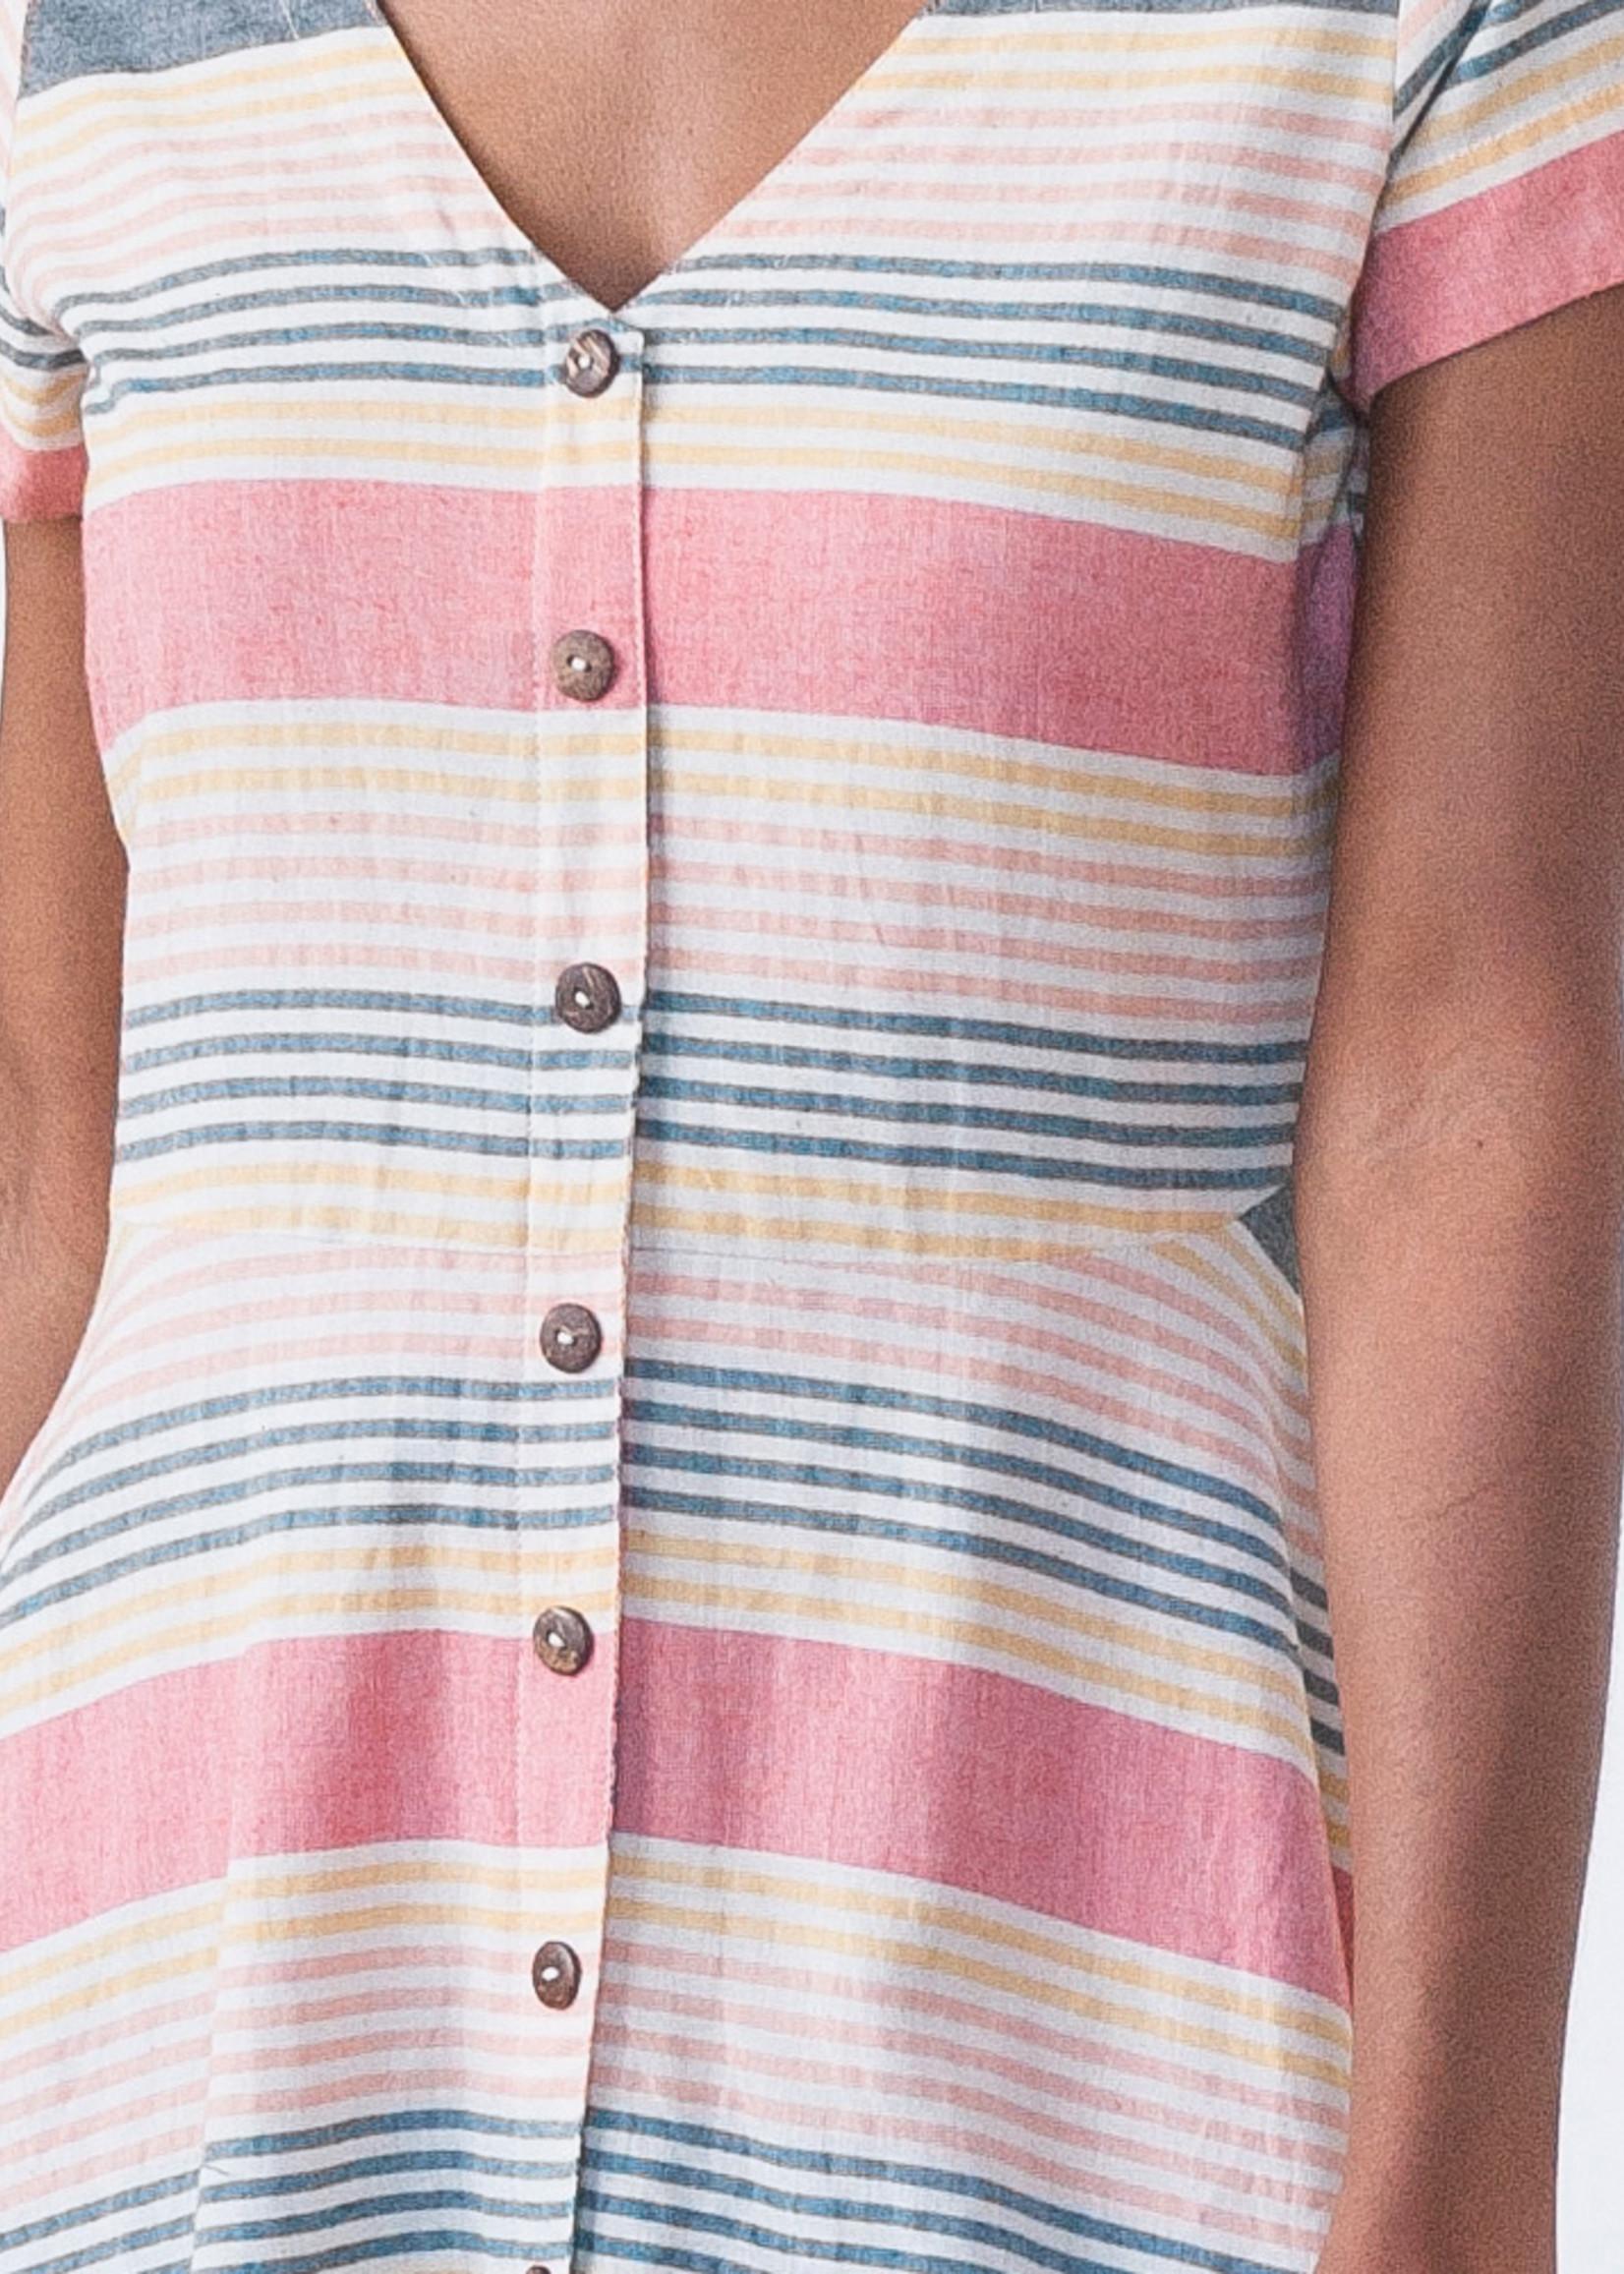 Mata Traders FINAL SALE Summer Stripe Daydreamer Dress *Size XL*